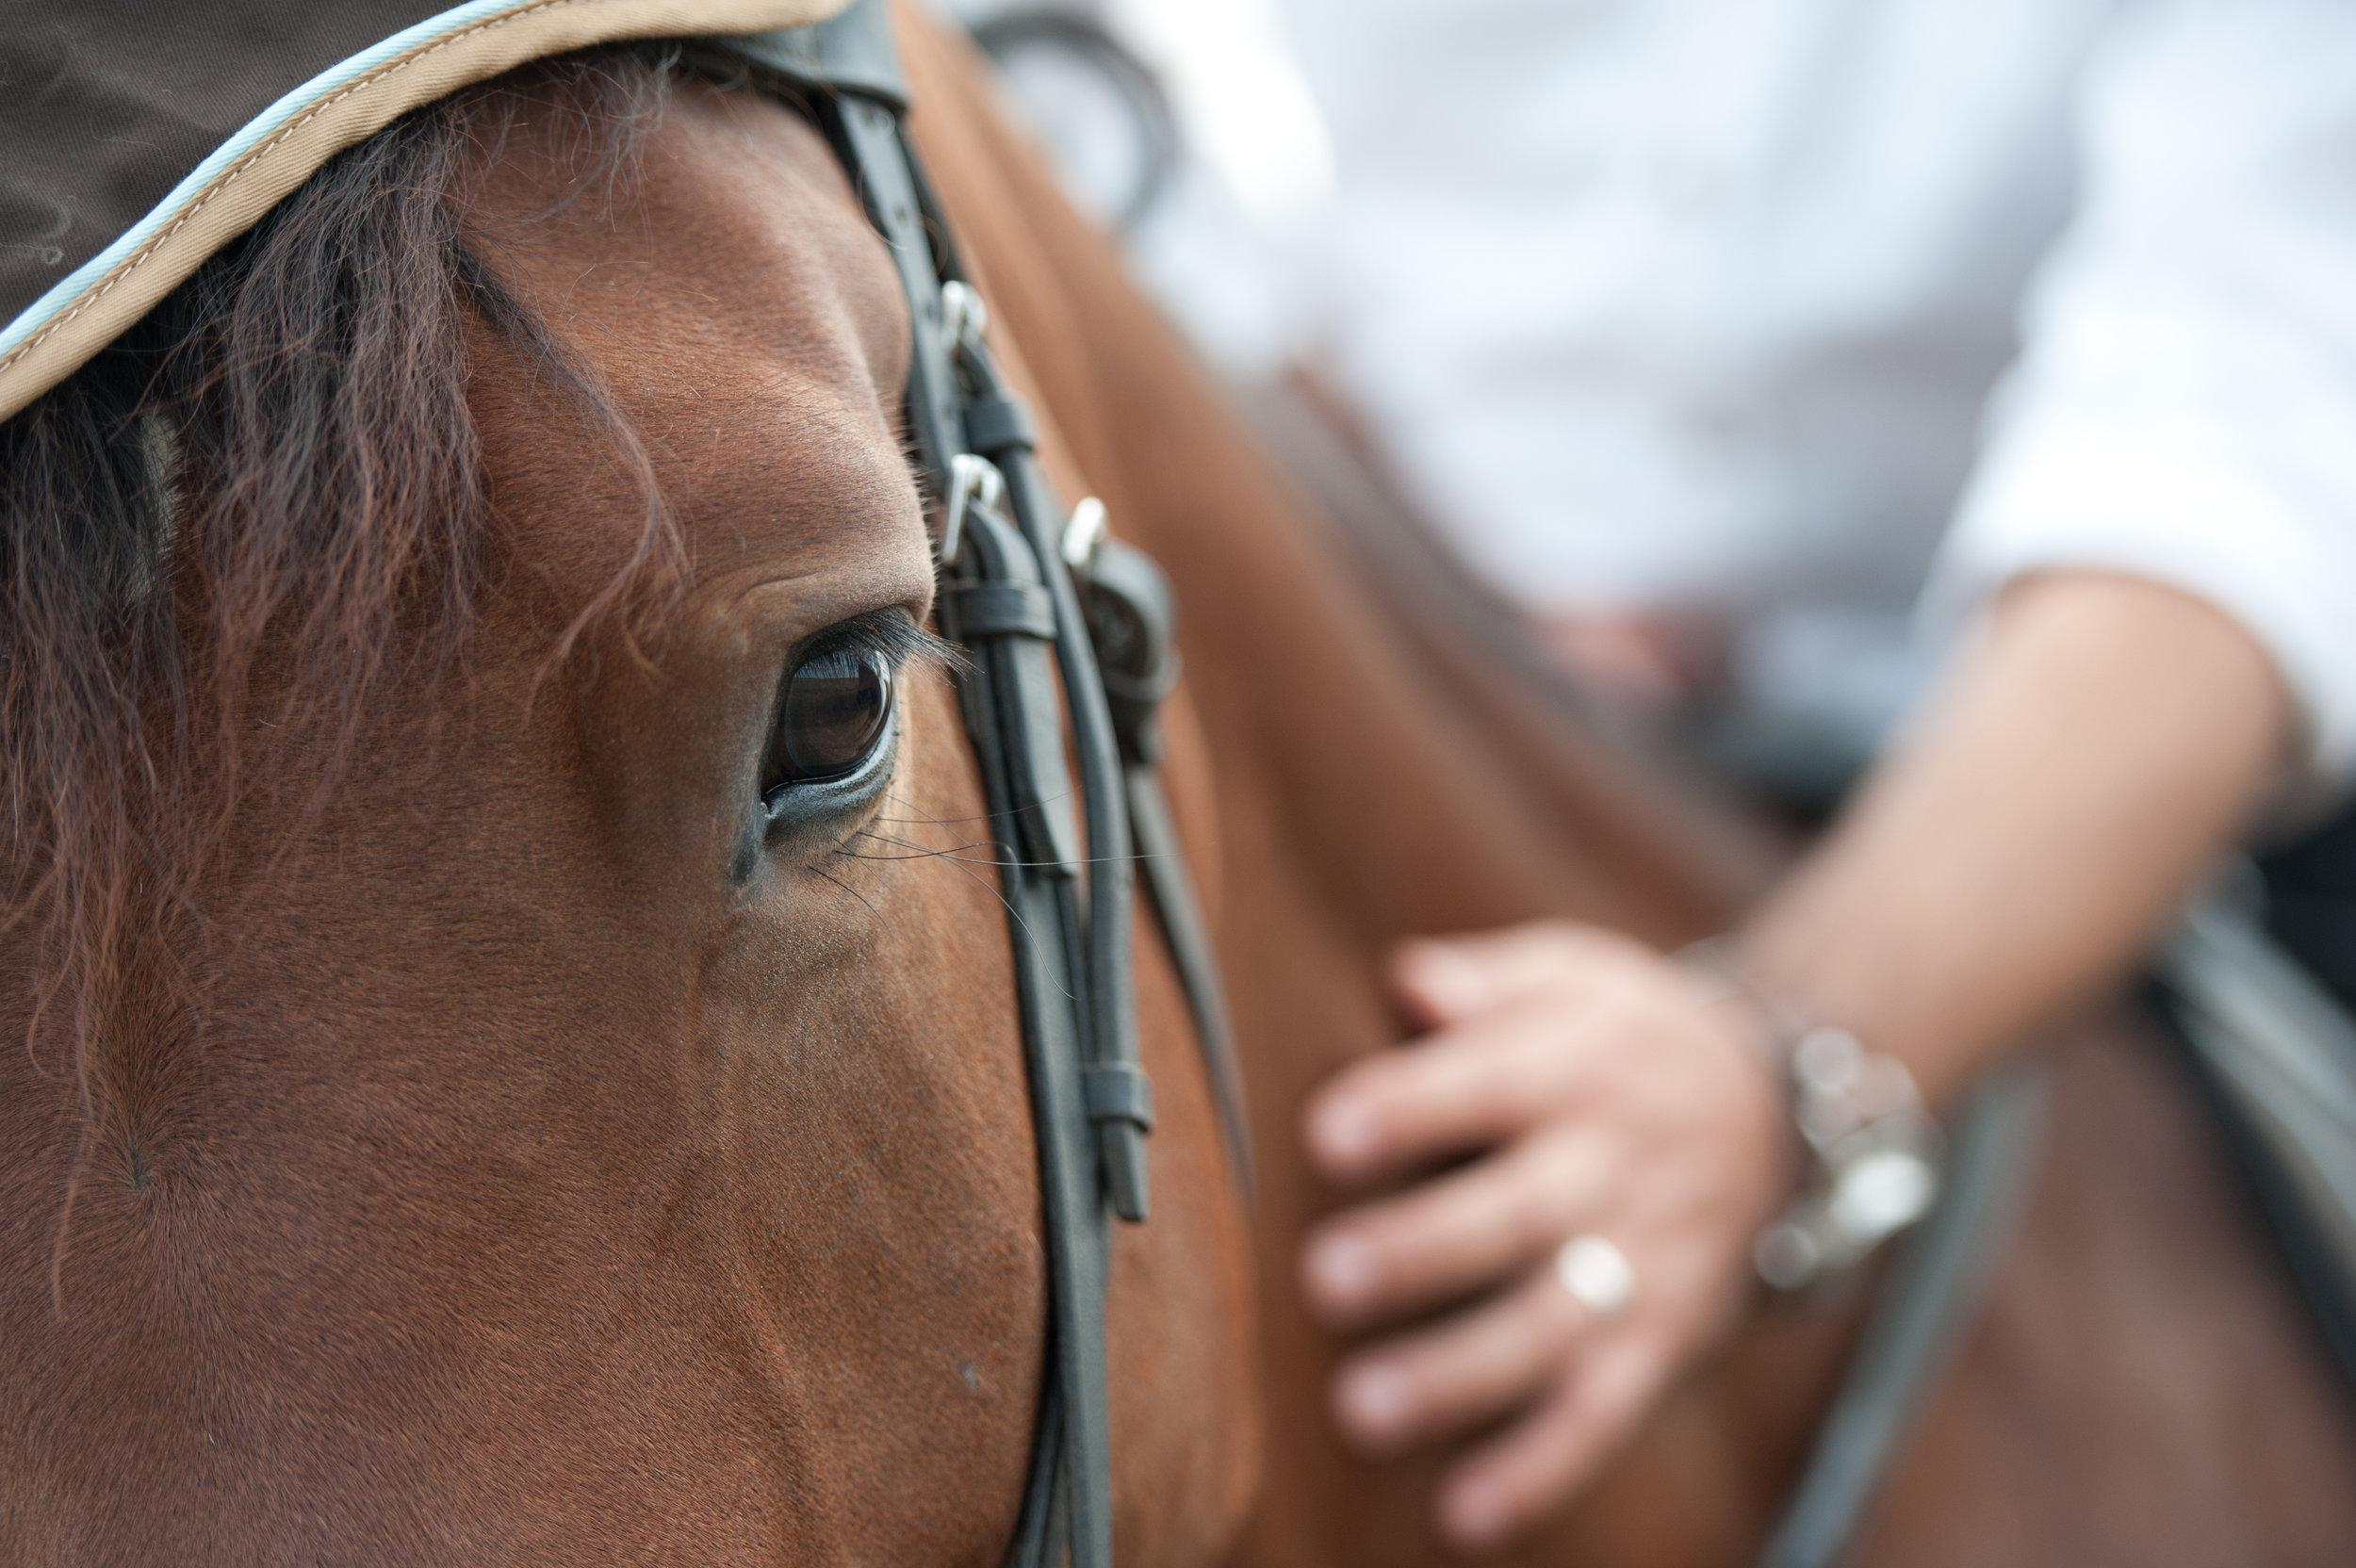 Hand on Horse.jpg